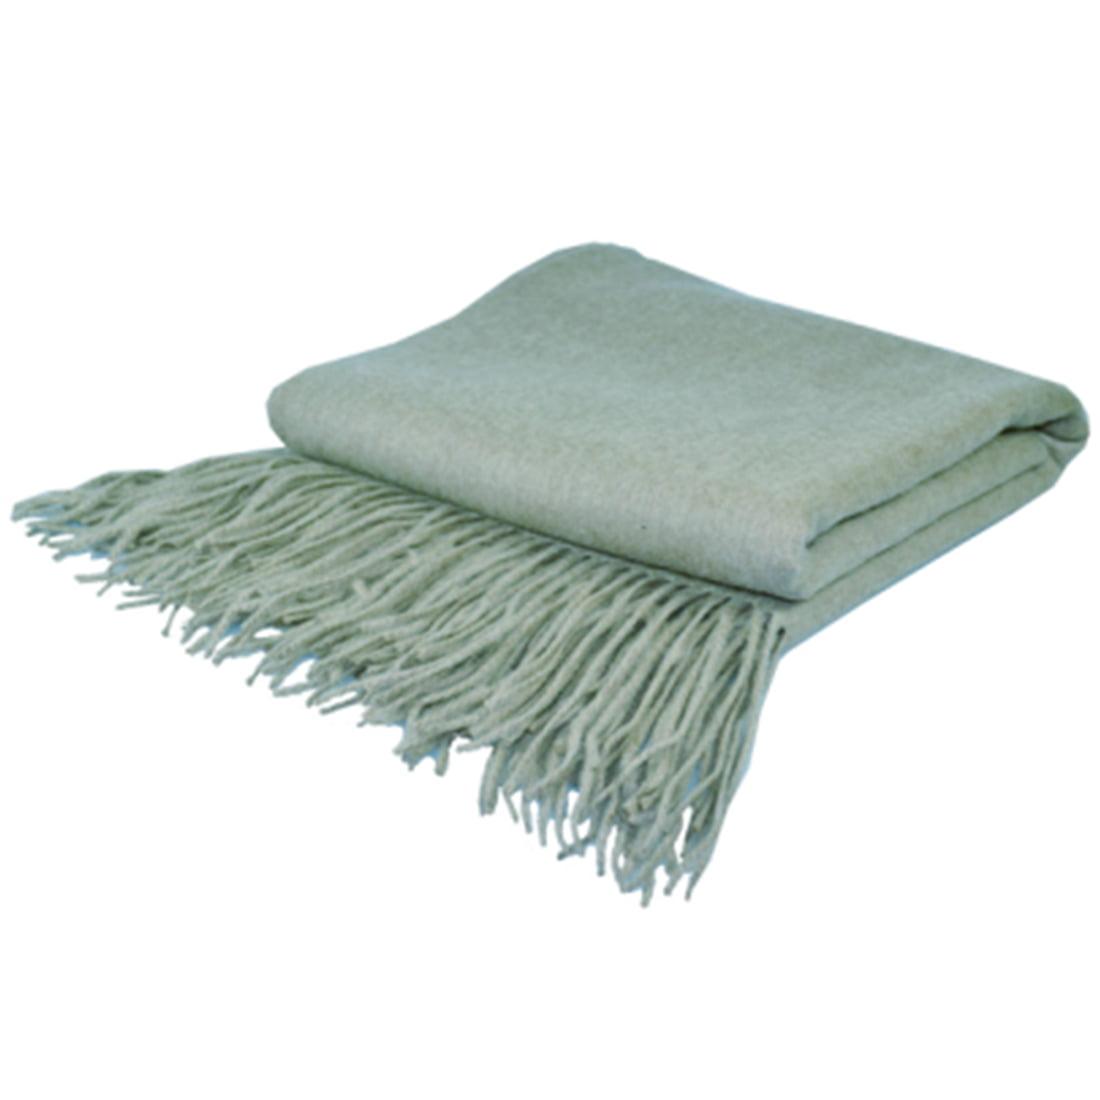 Indigo7 Authorized 50/50 Signature Cashmere Waterweave Throw